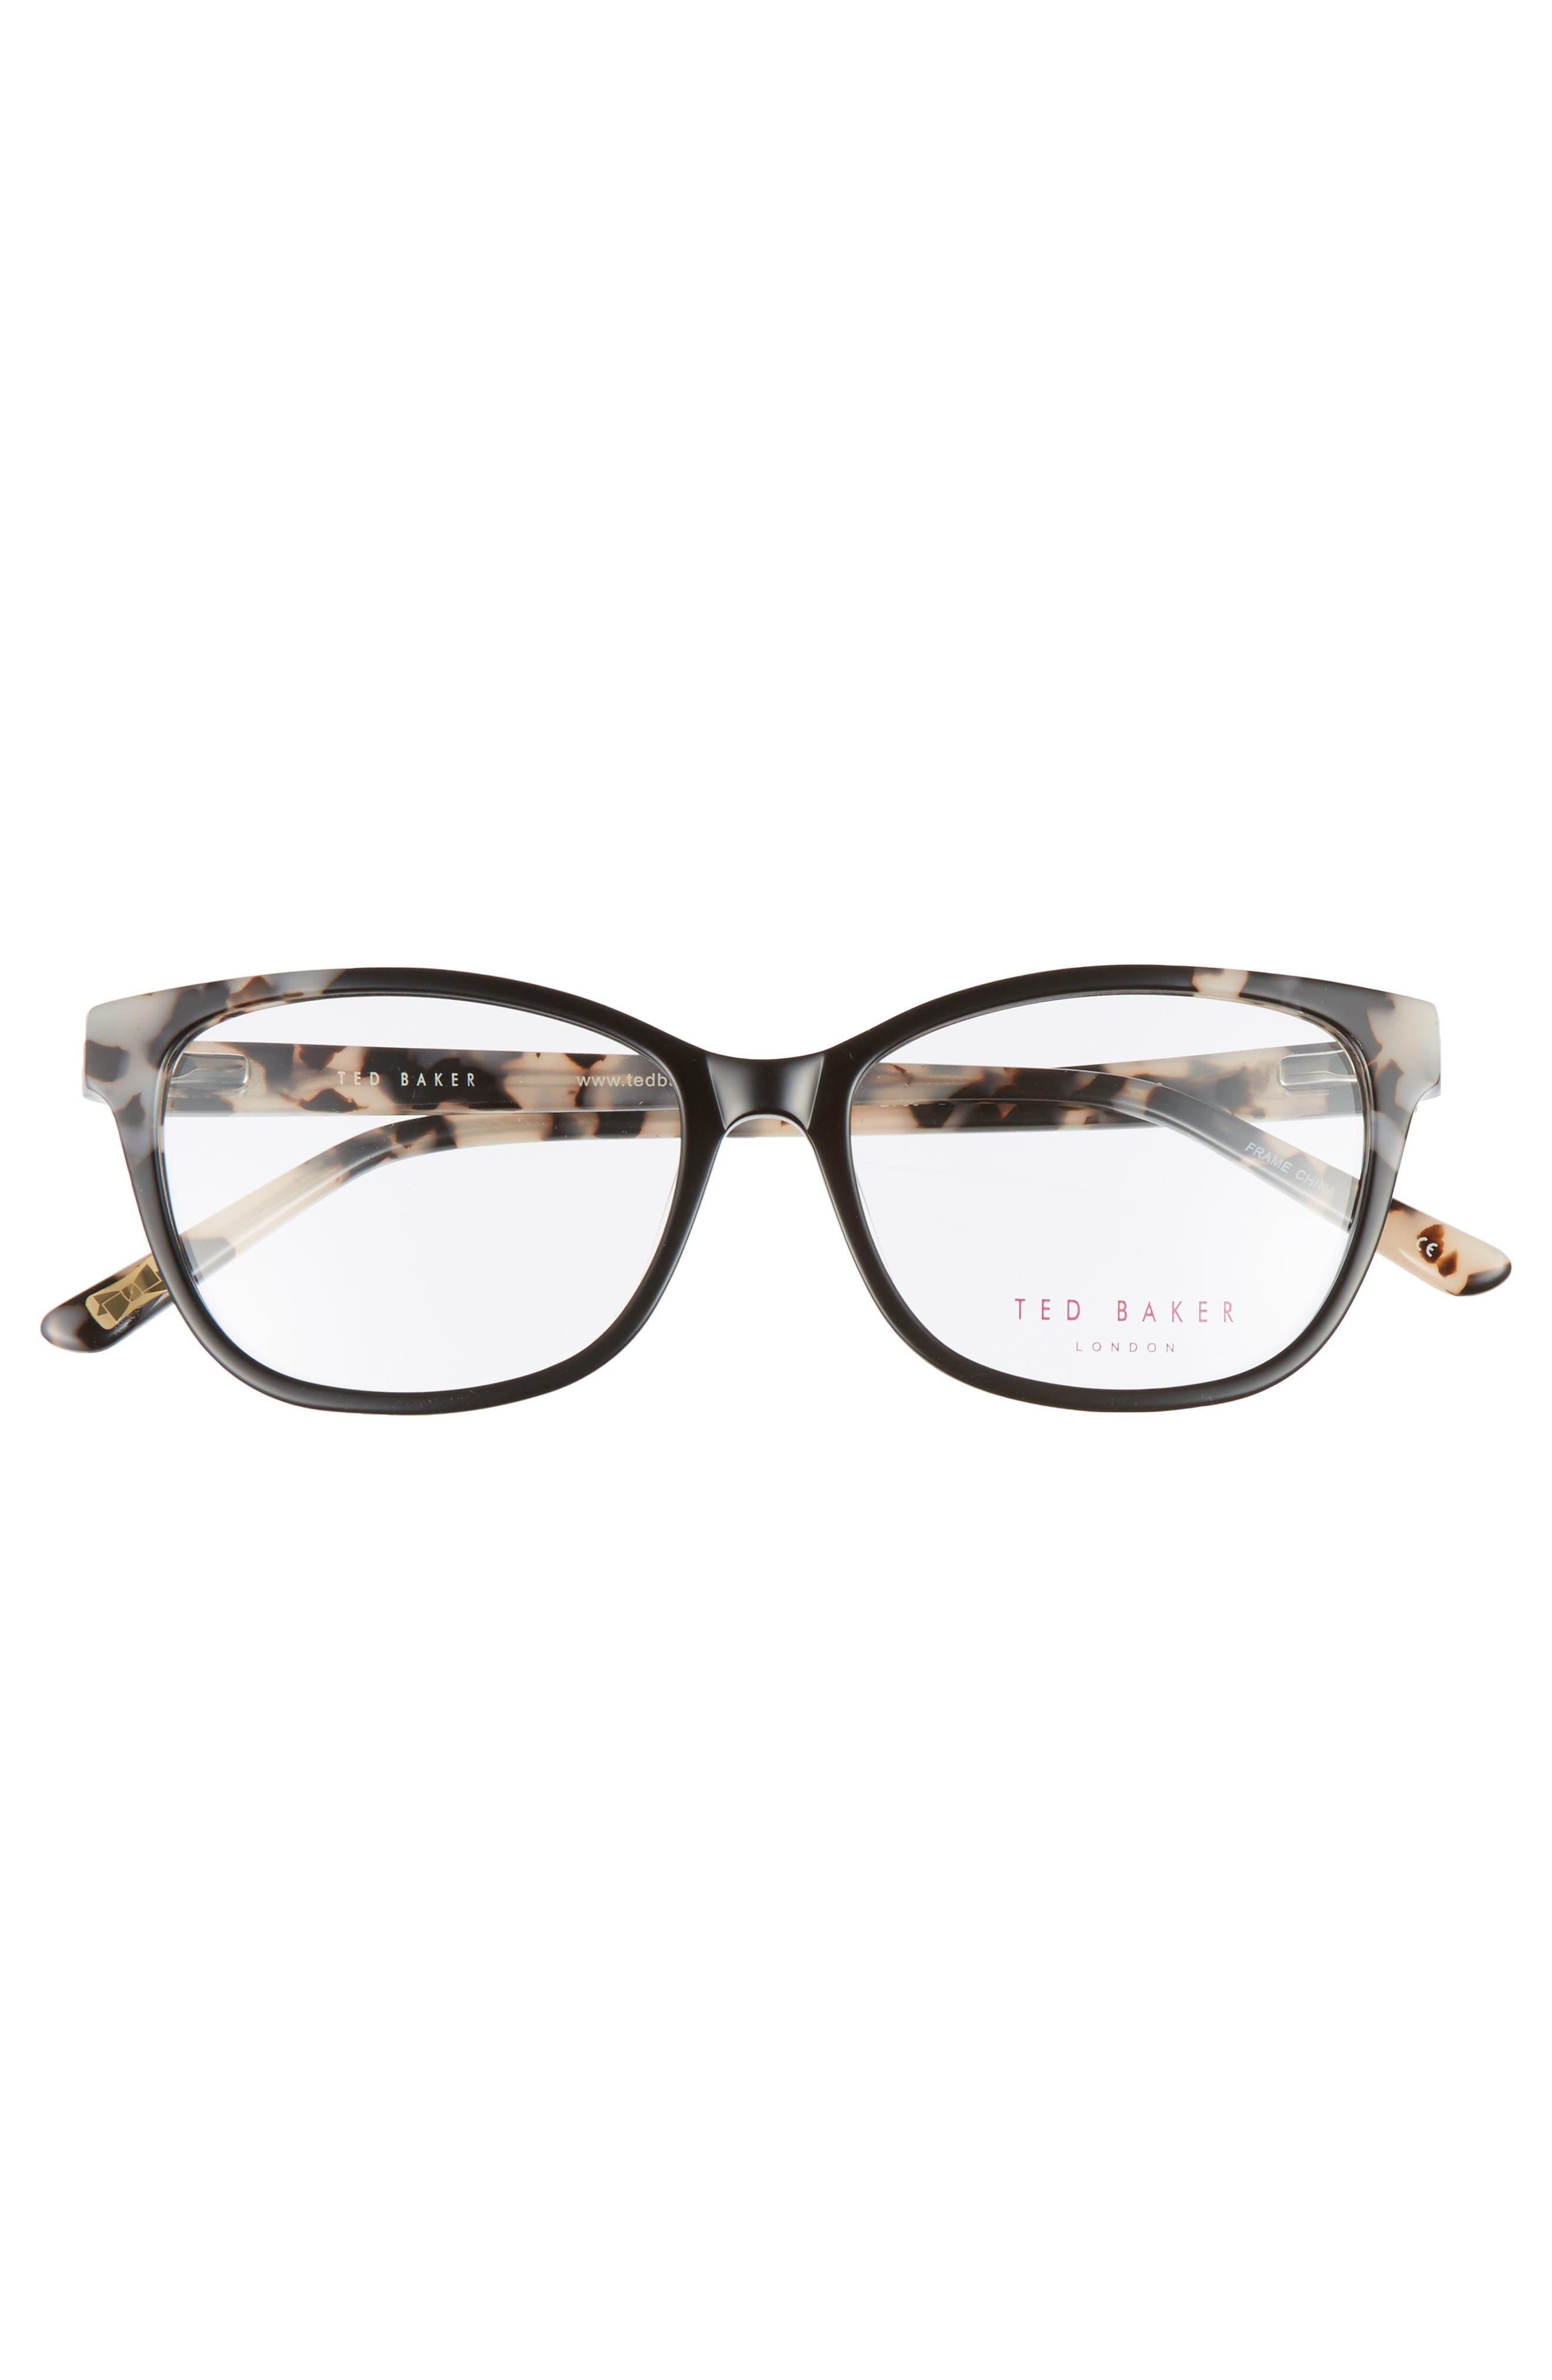 52mm Square Optical Glasses,                             Alternate thumbnail 3, color,                             Black